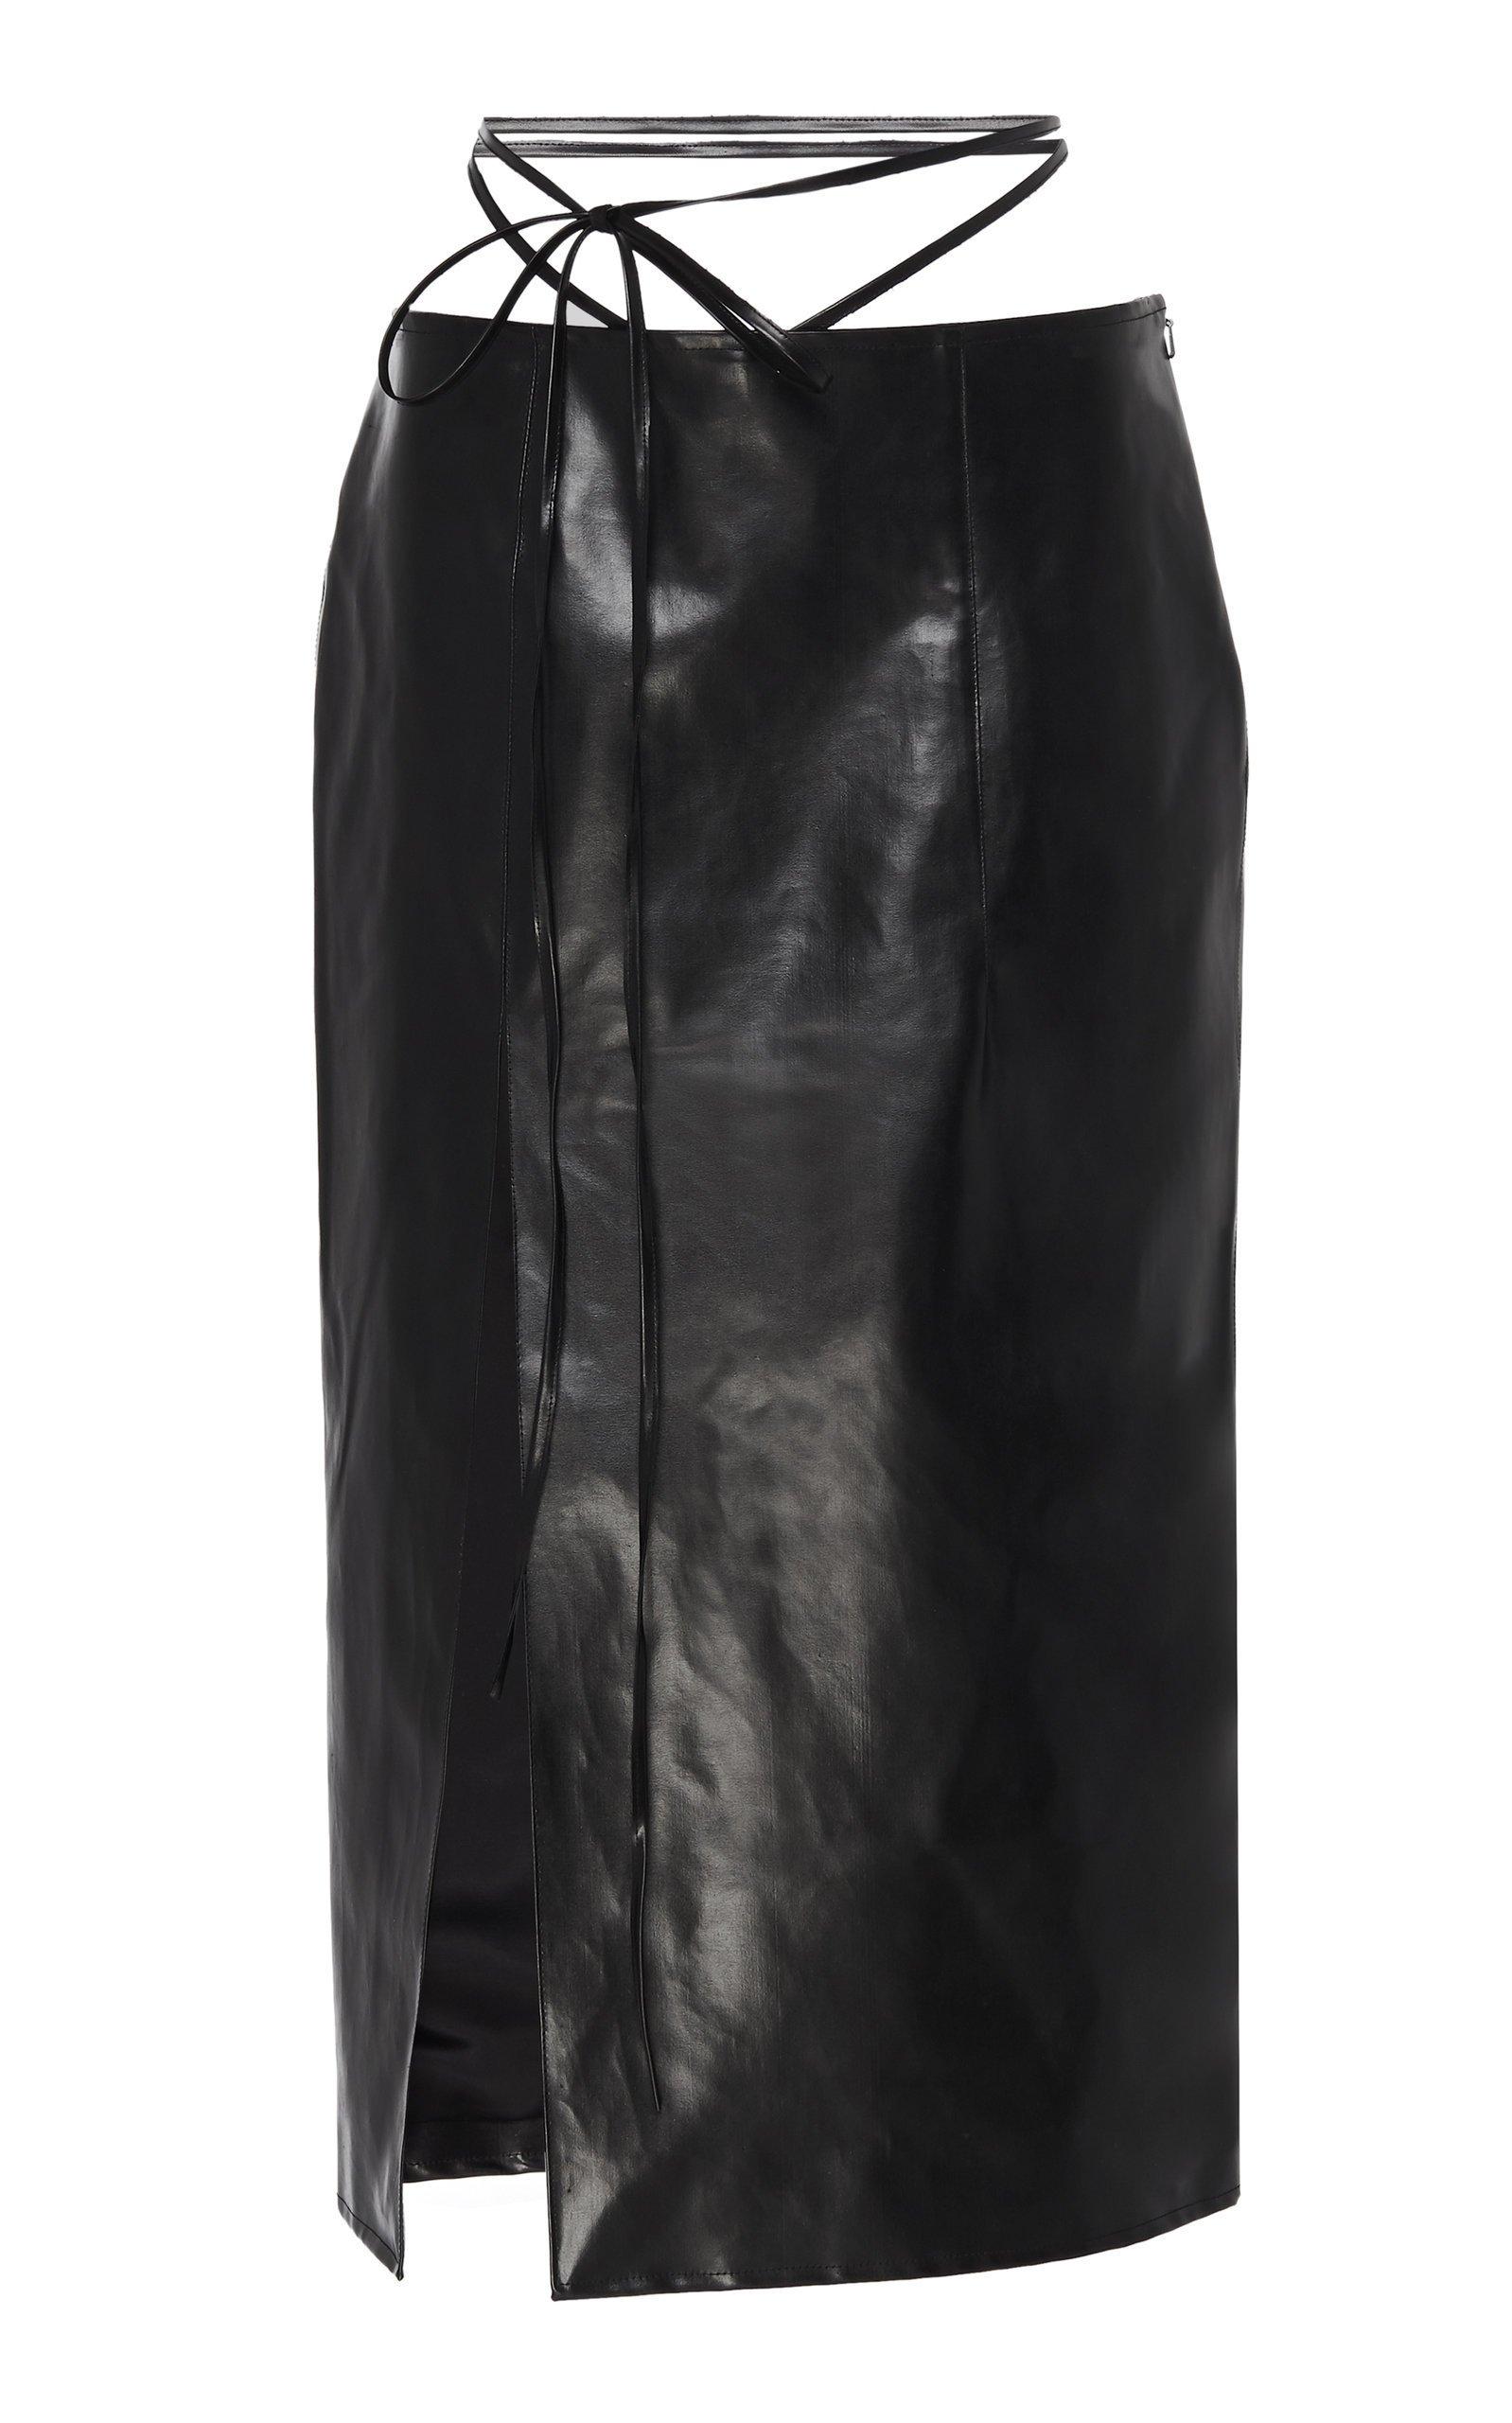 Supriya Lele Vinyl Pencil Skirt Size: L